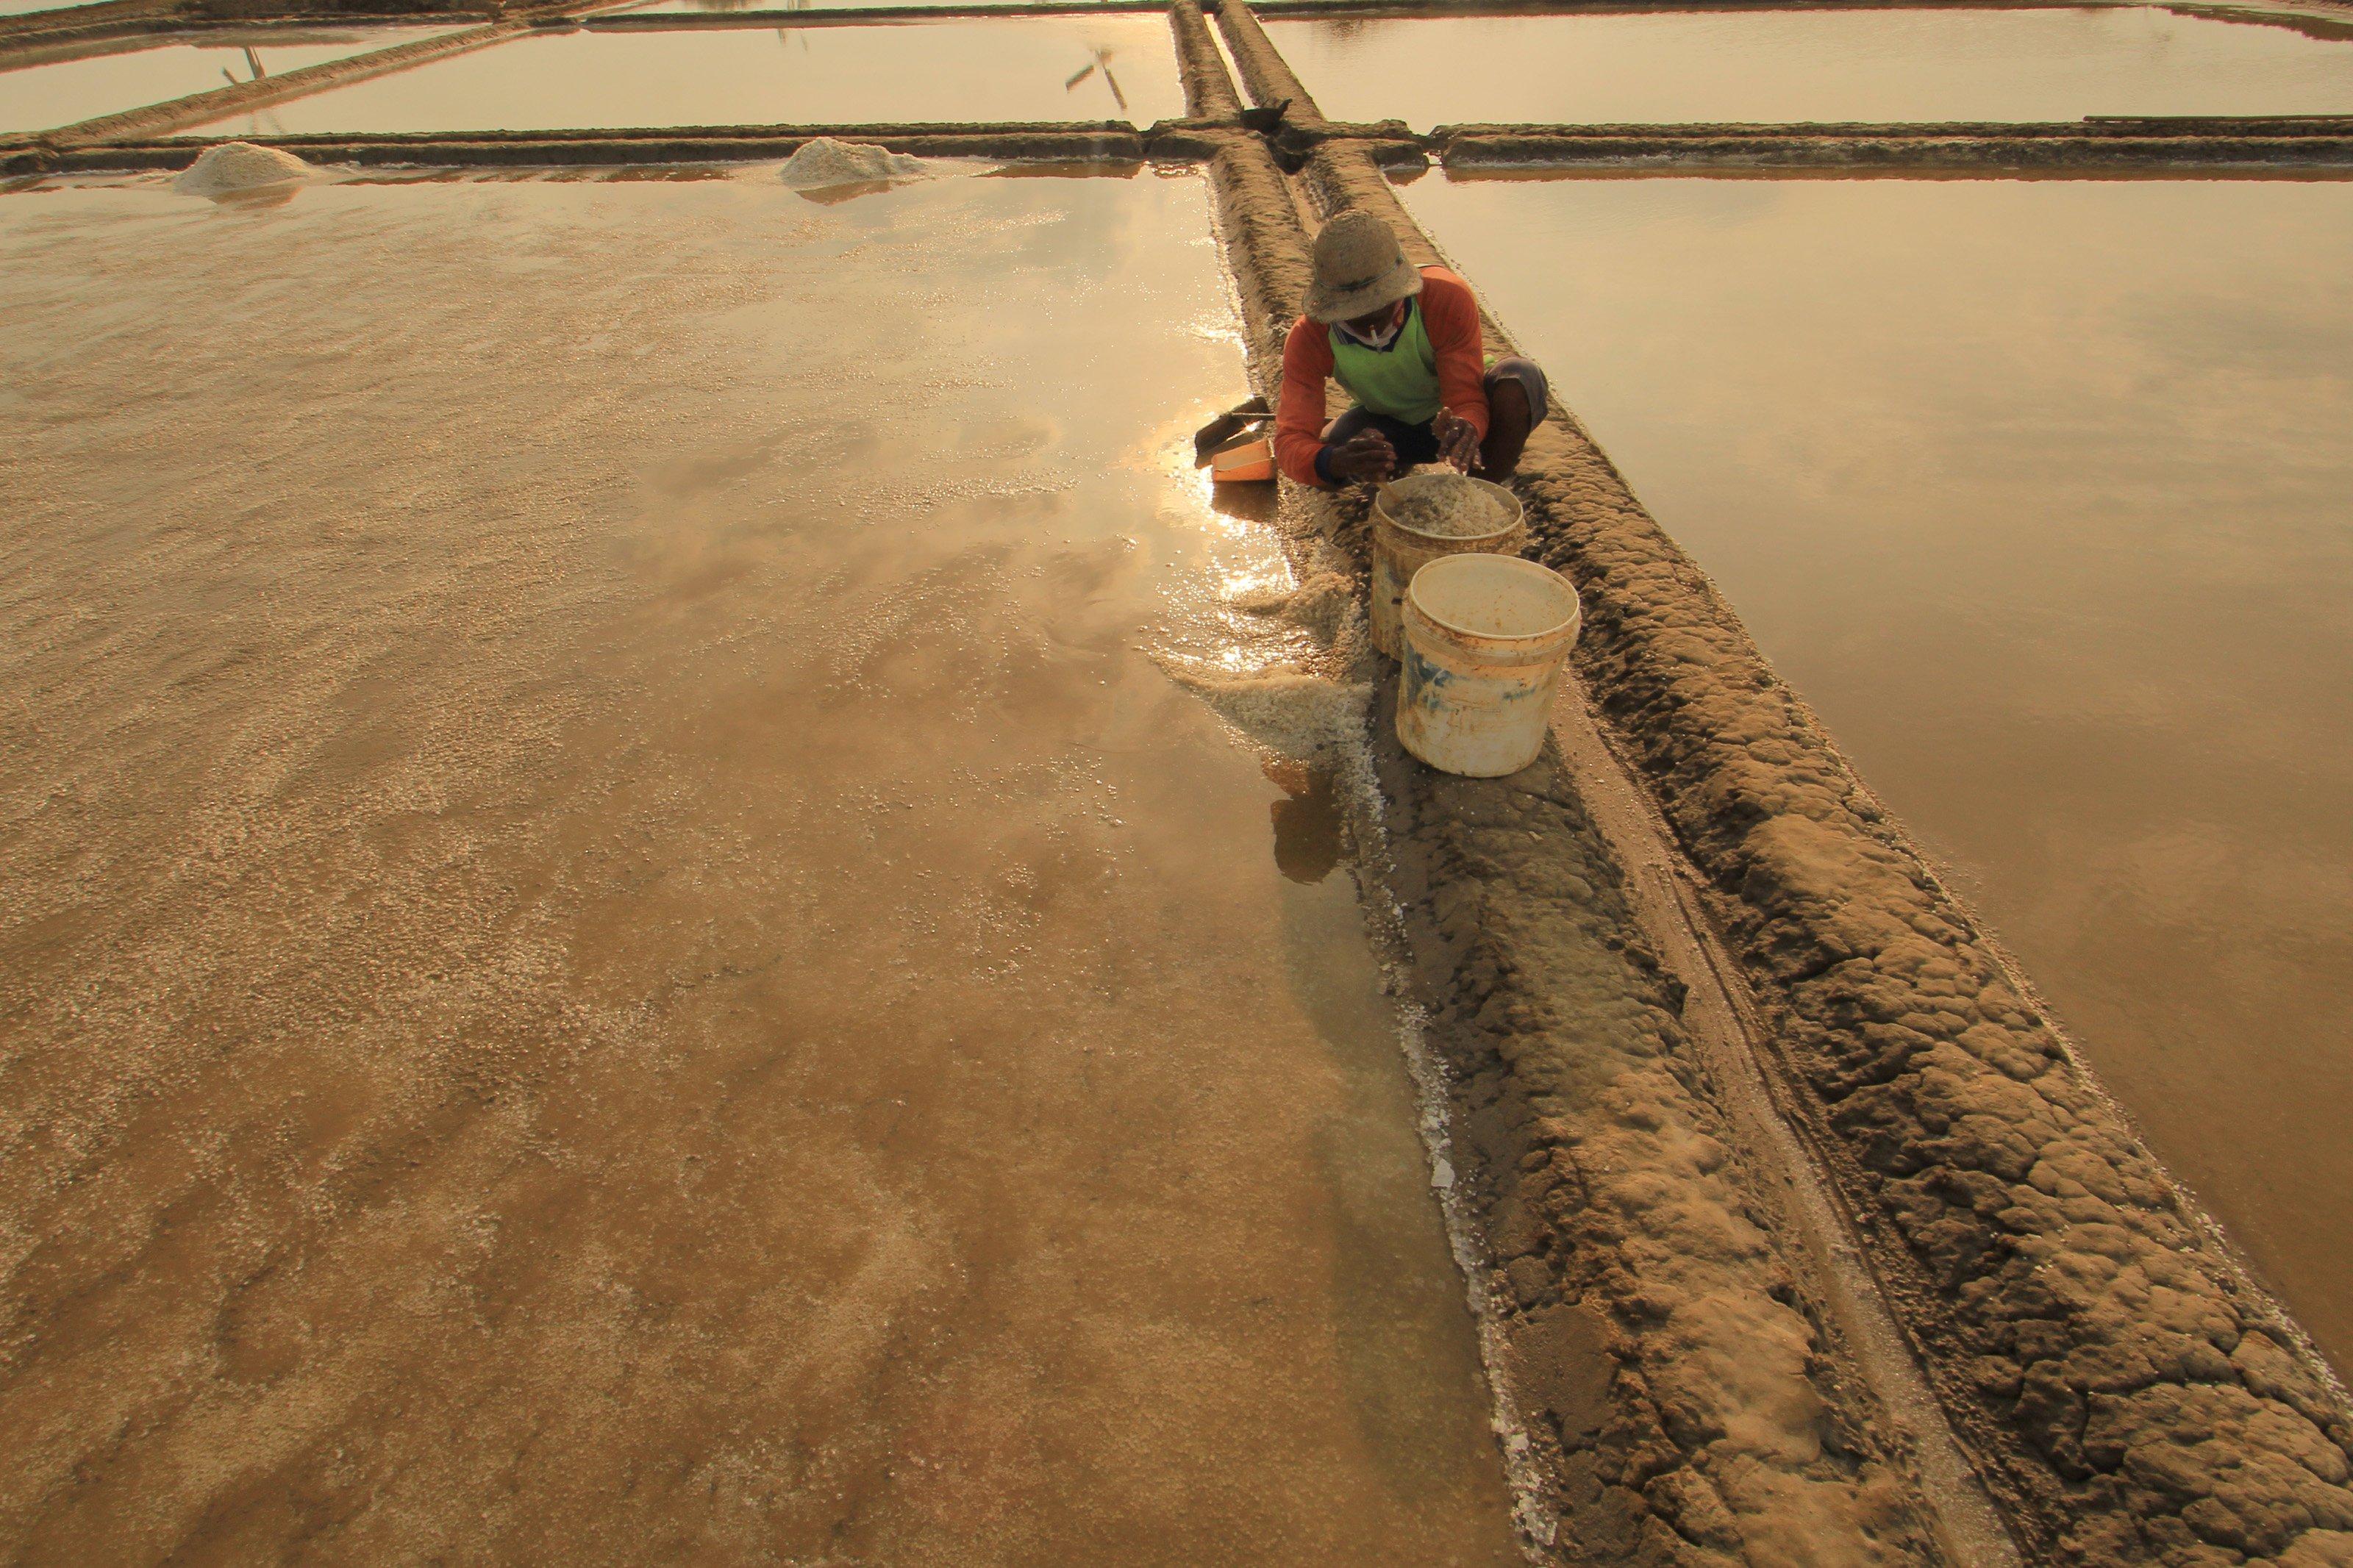 Petani harus pandai-pandai menakar air ke dalam petakan lahan, setelah itu air diuapkan di bawah terik matahari selama tujuh hari.